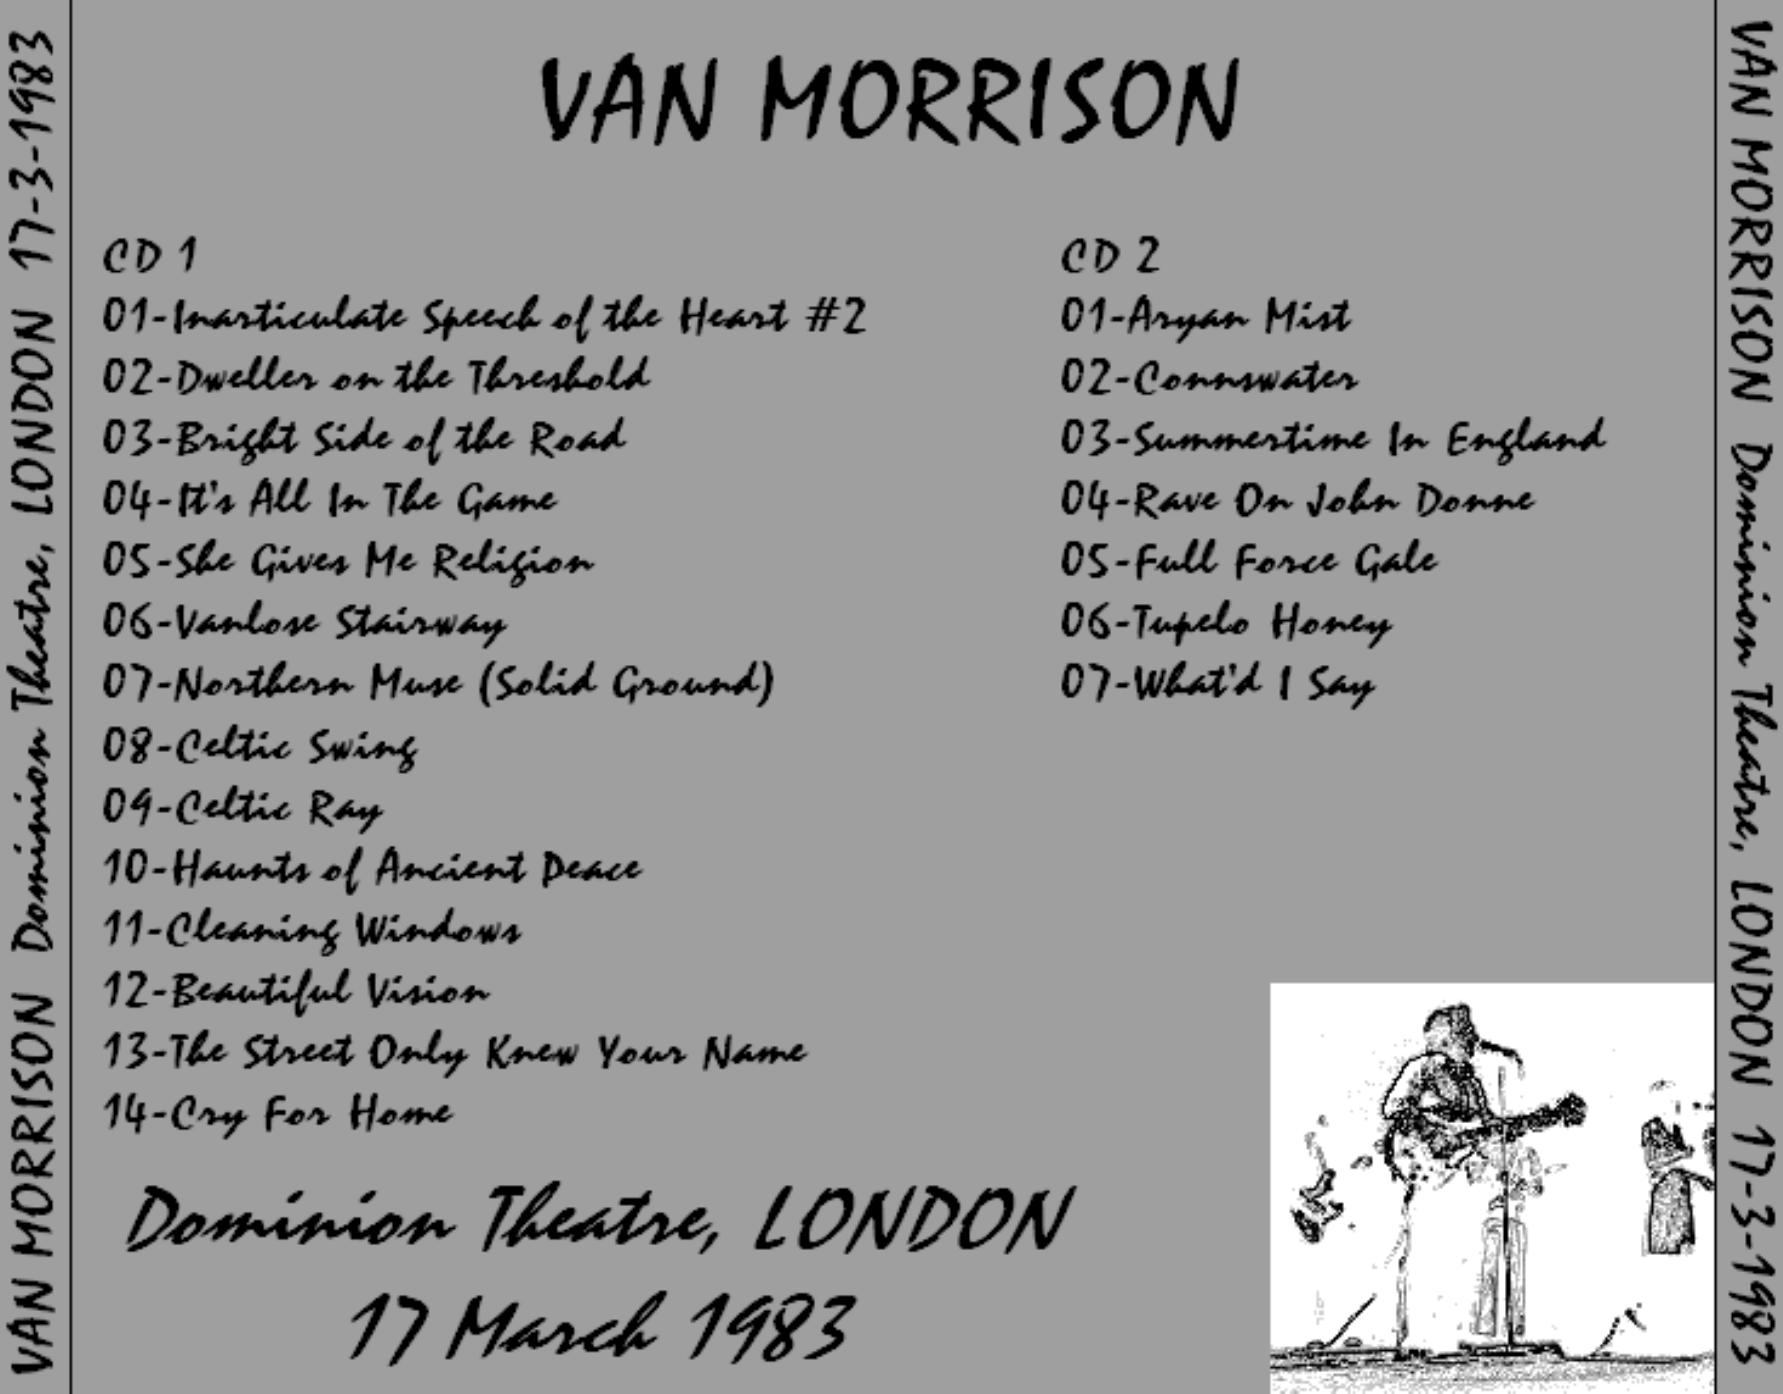 VanMorrison1983-03-17DominionTheatreLondonUK.jpg